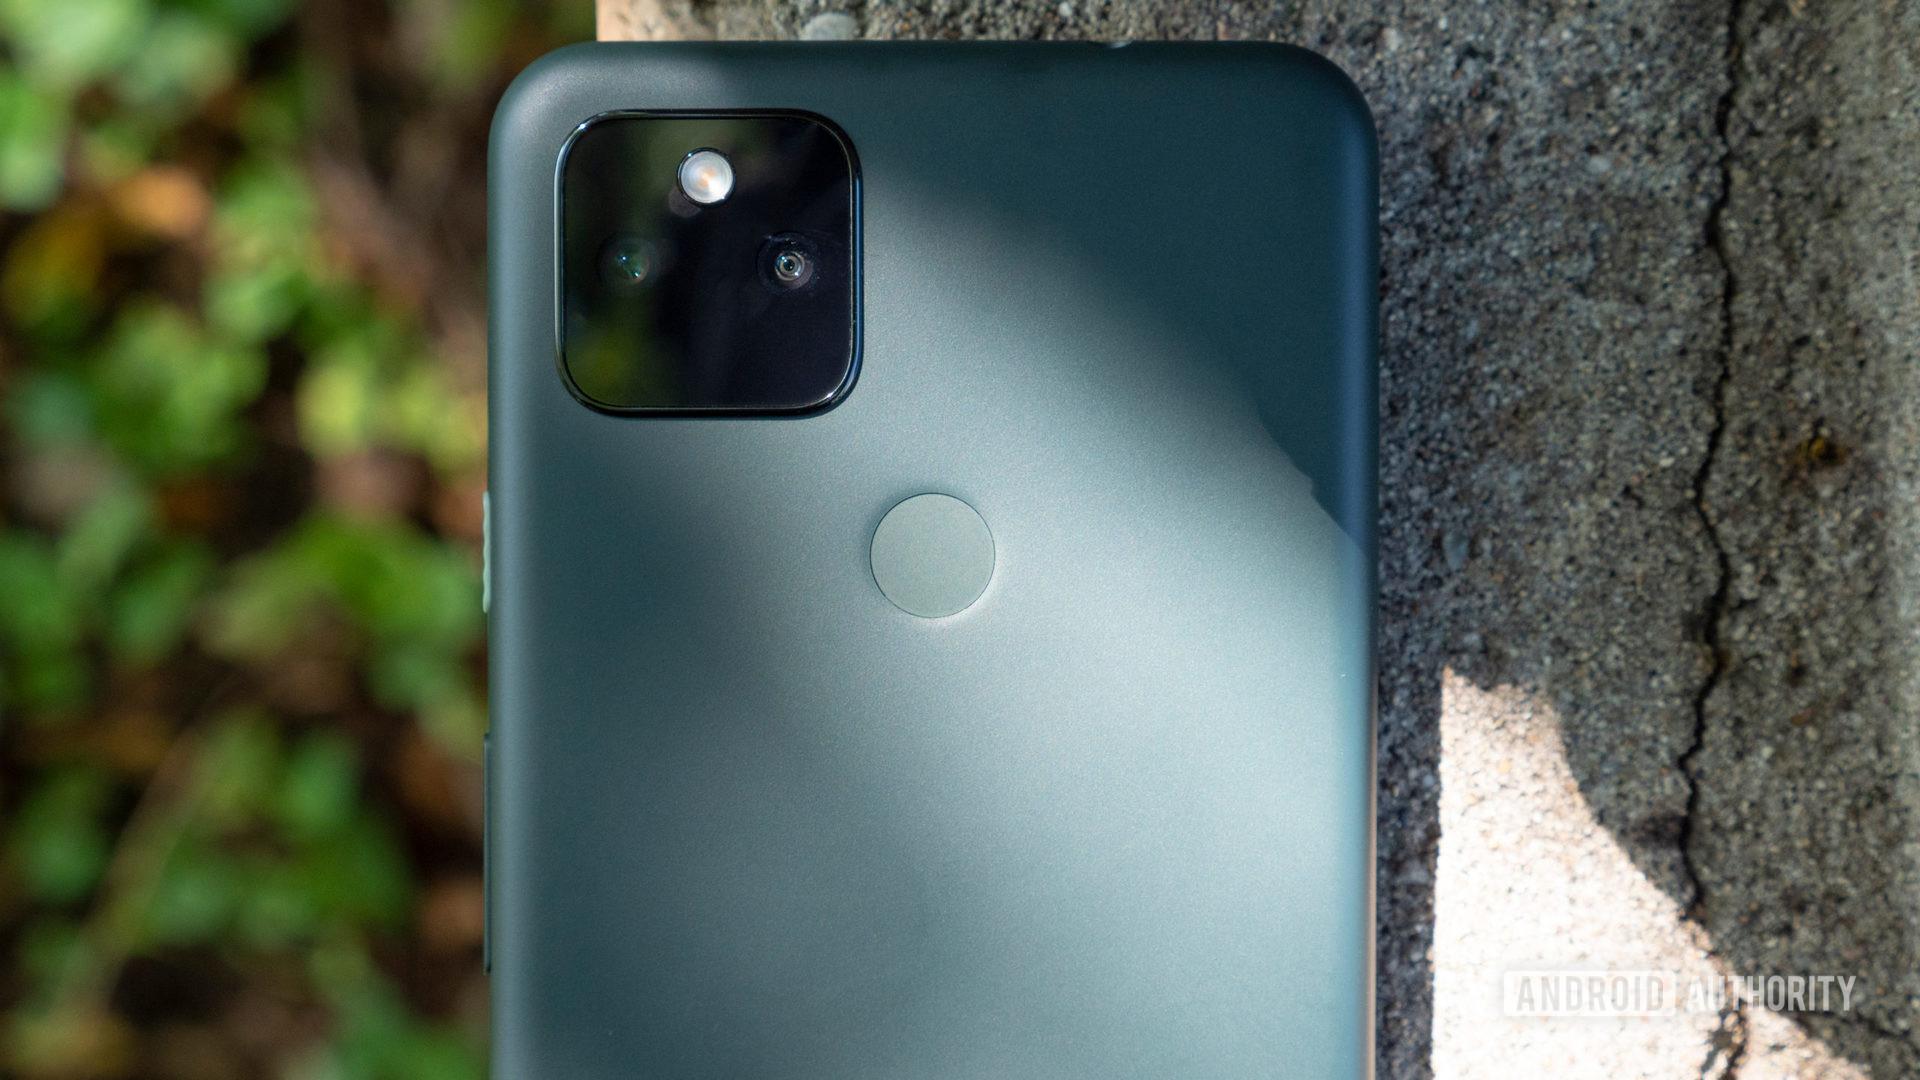 google pixel 5a pada sepotong semen menunjukkan punggungnya sebagian besar berwarna hitam dengan kamera close up